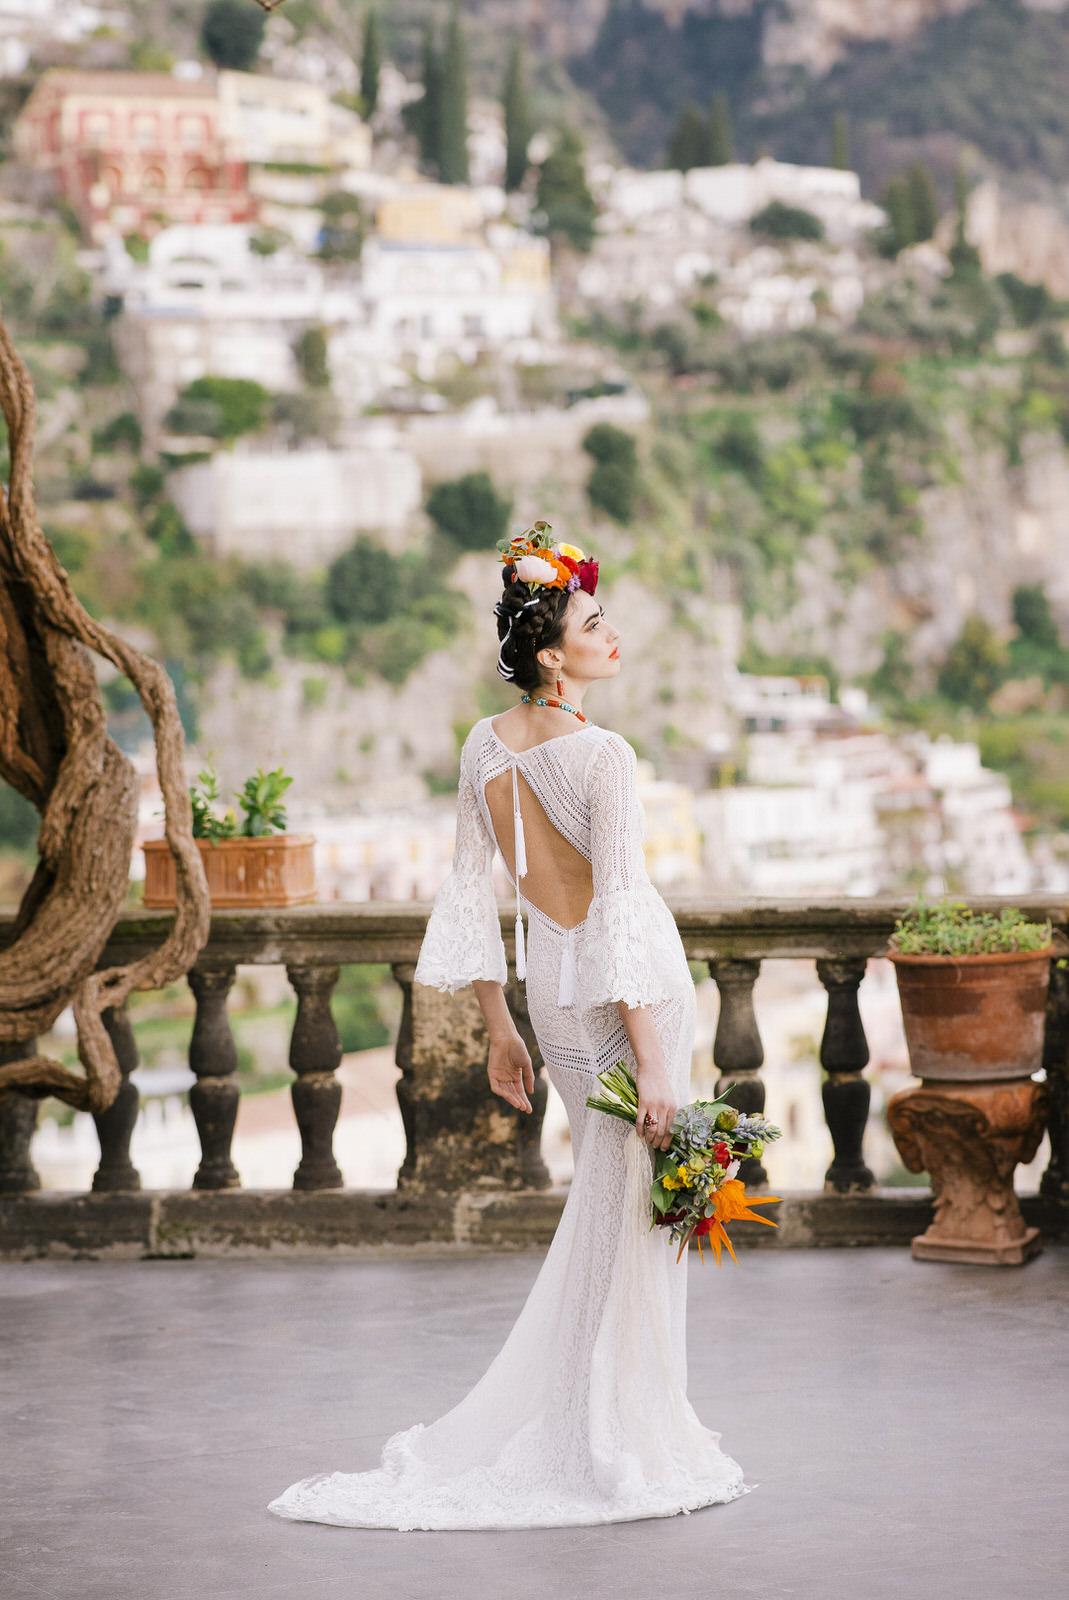 bride's portrait on a terrace with her bouquet